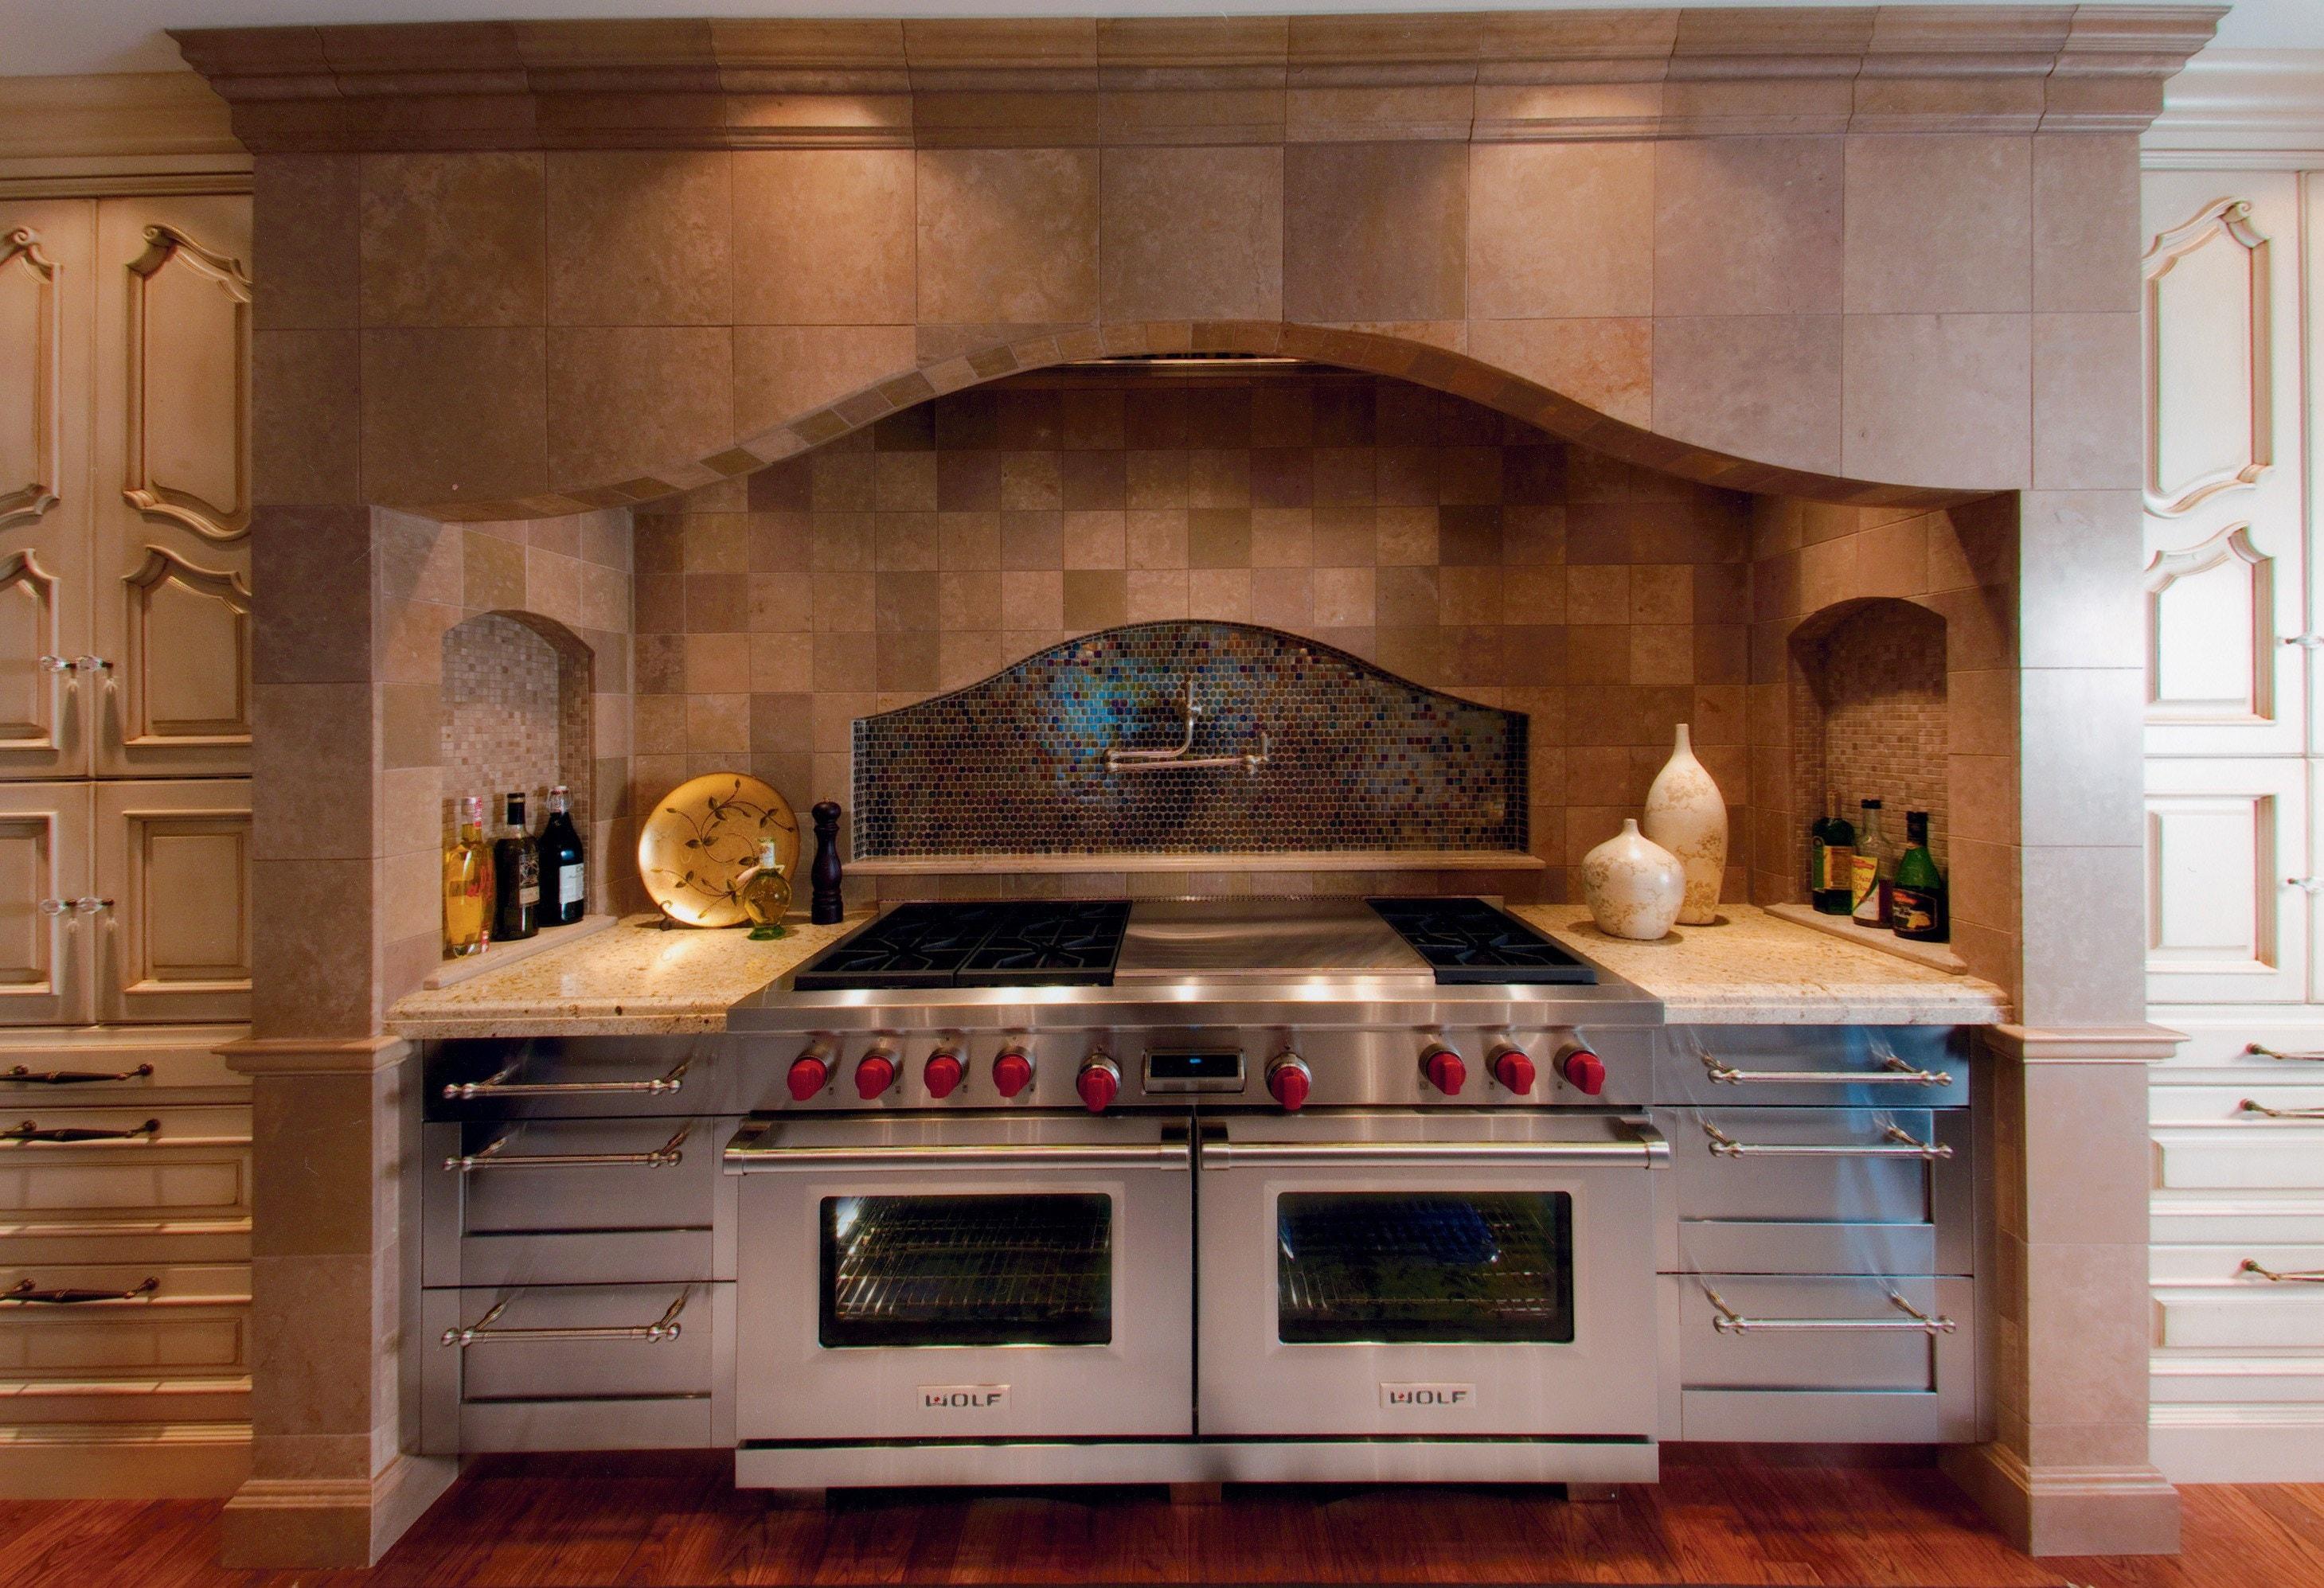 wolf stove kitchen stainless steel backsplash belle maison subzero wolf and cove kitchens